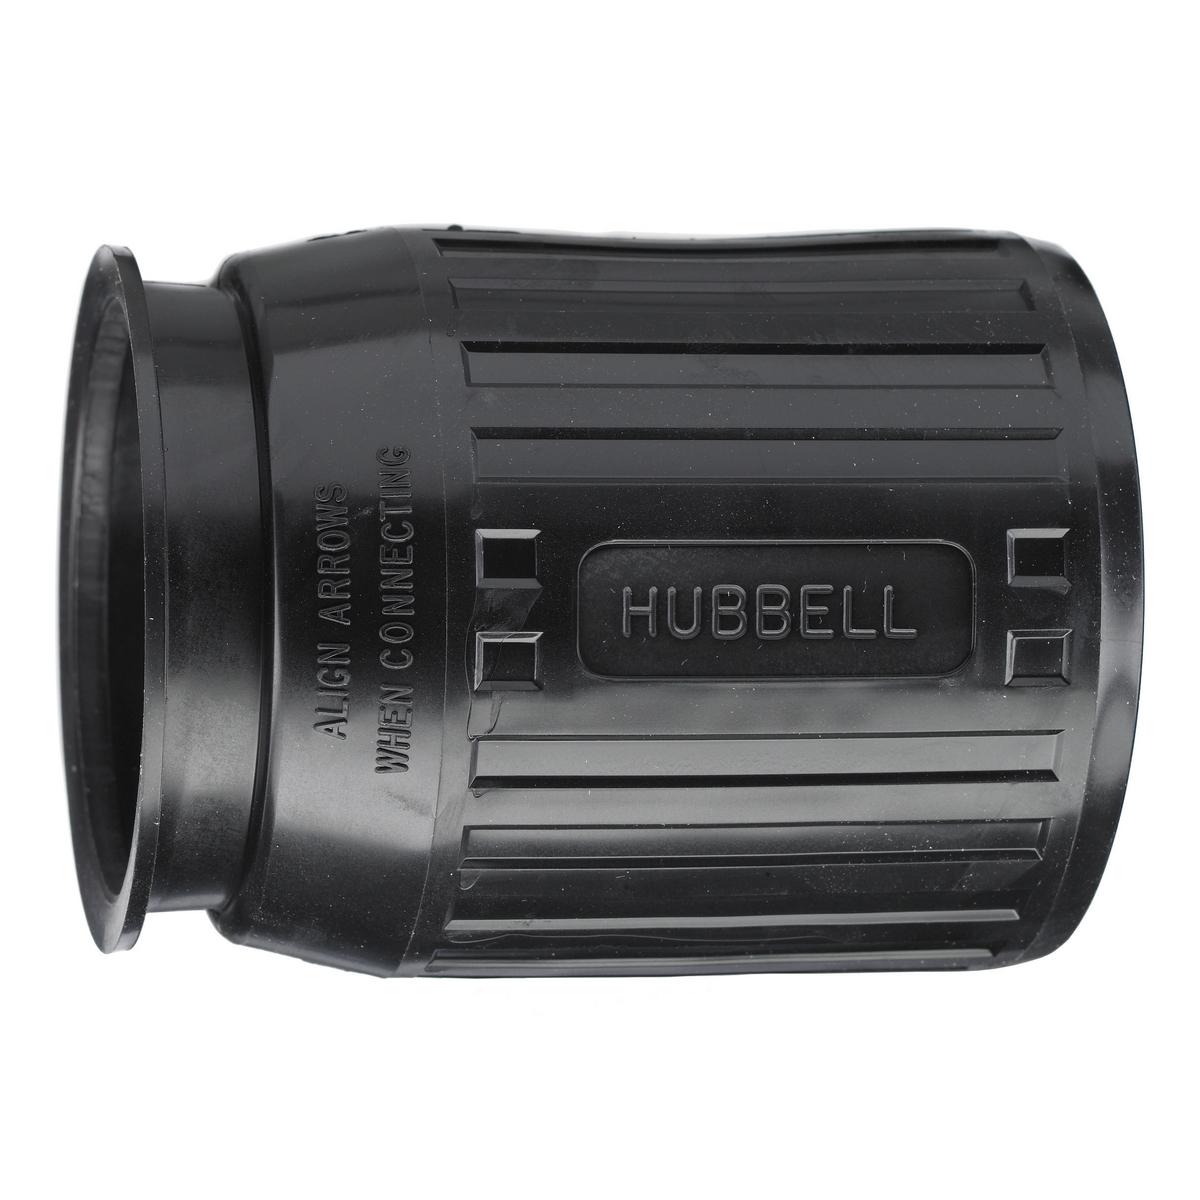 Hubbell HBL7716C Black Weatherproof Device Boot